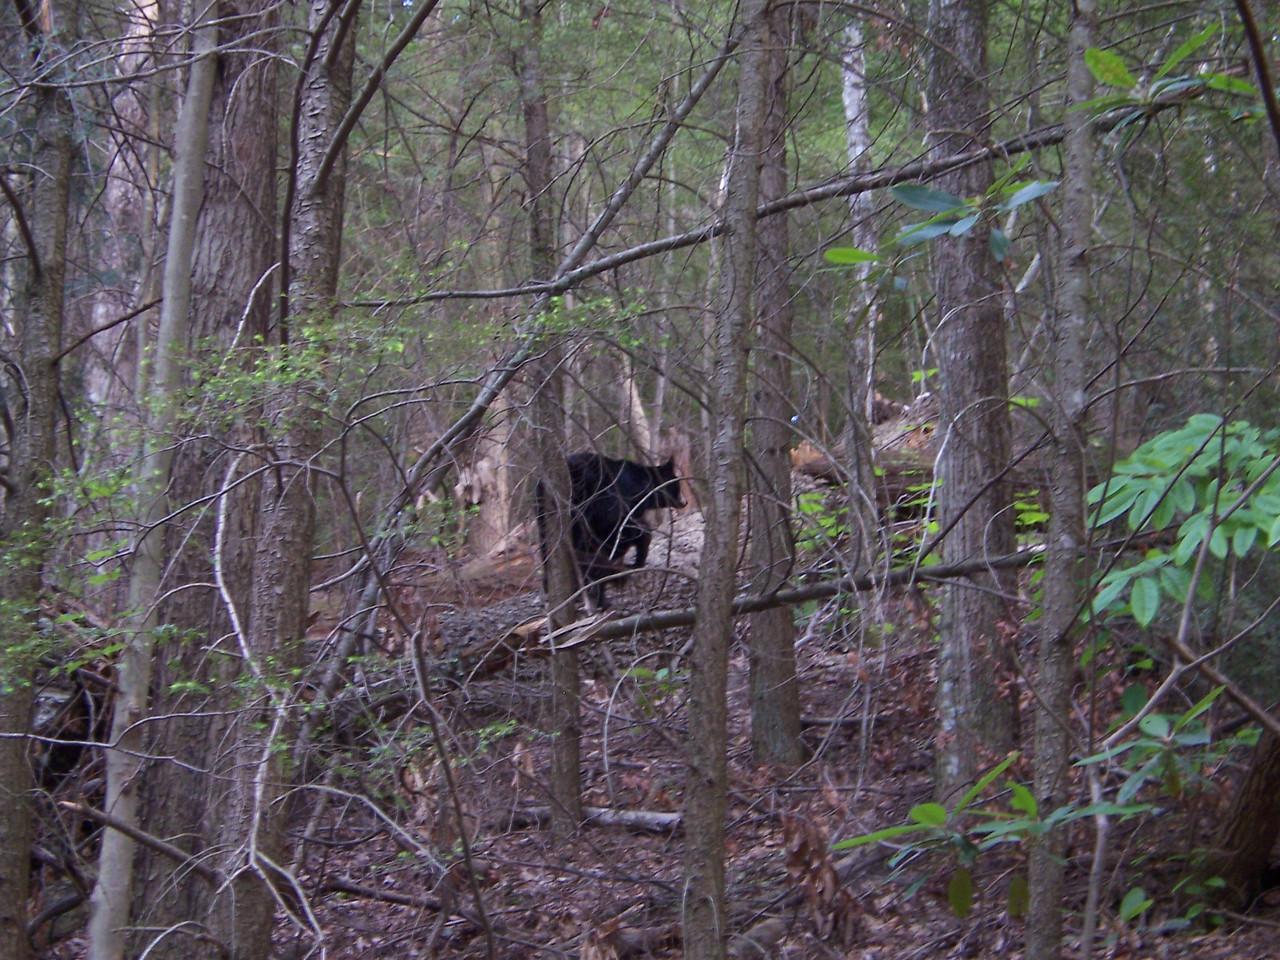 a momma bear with 2 cubs